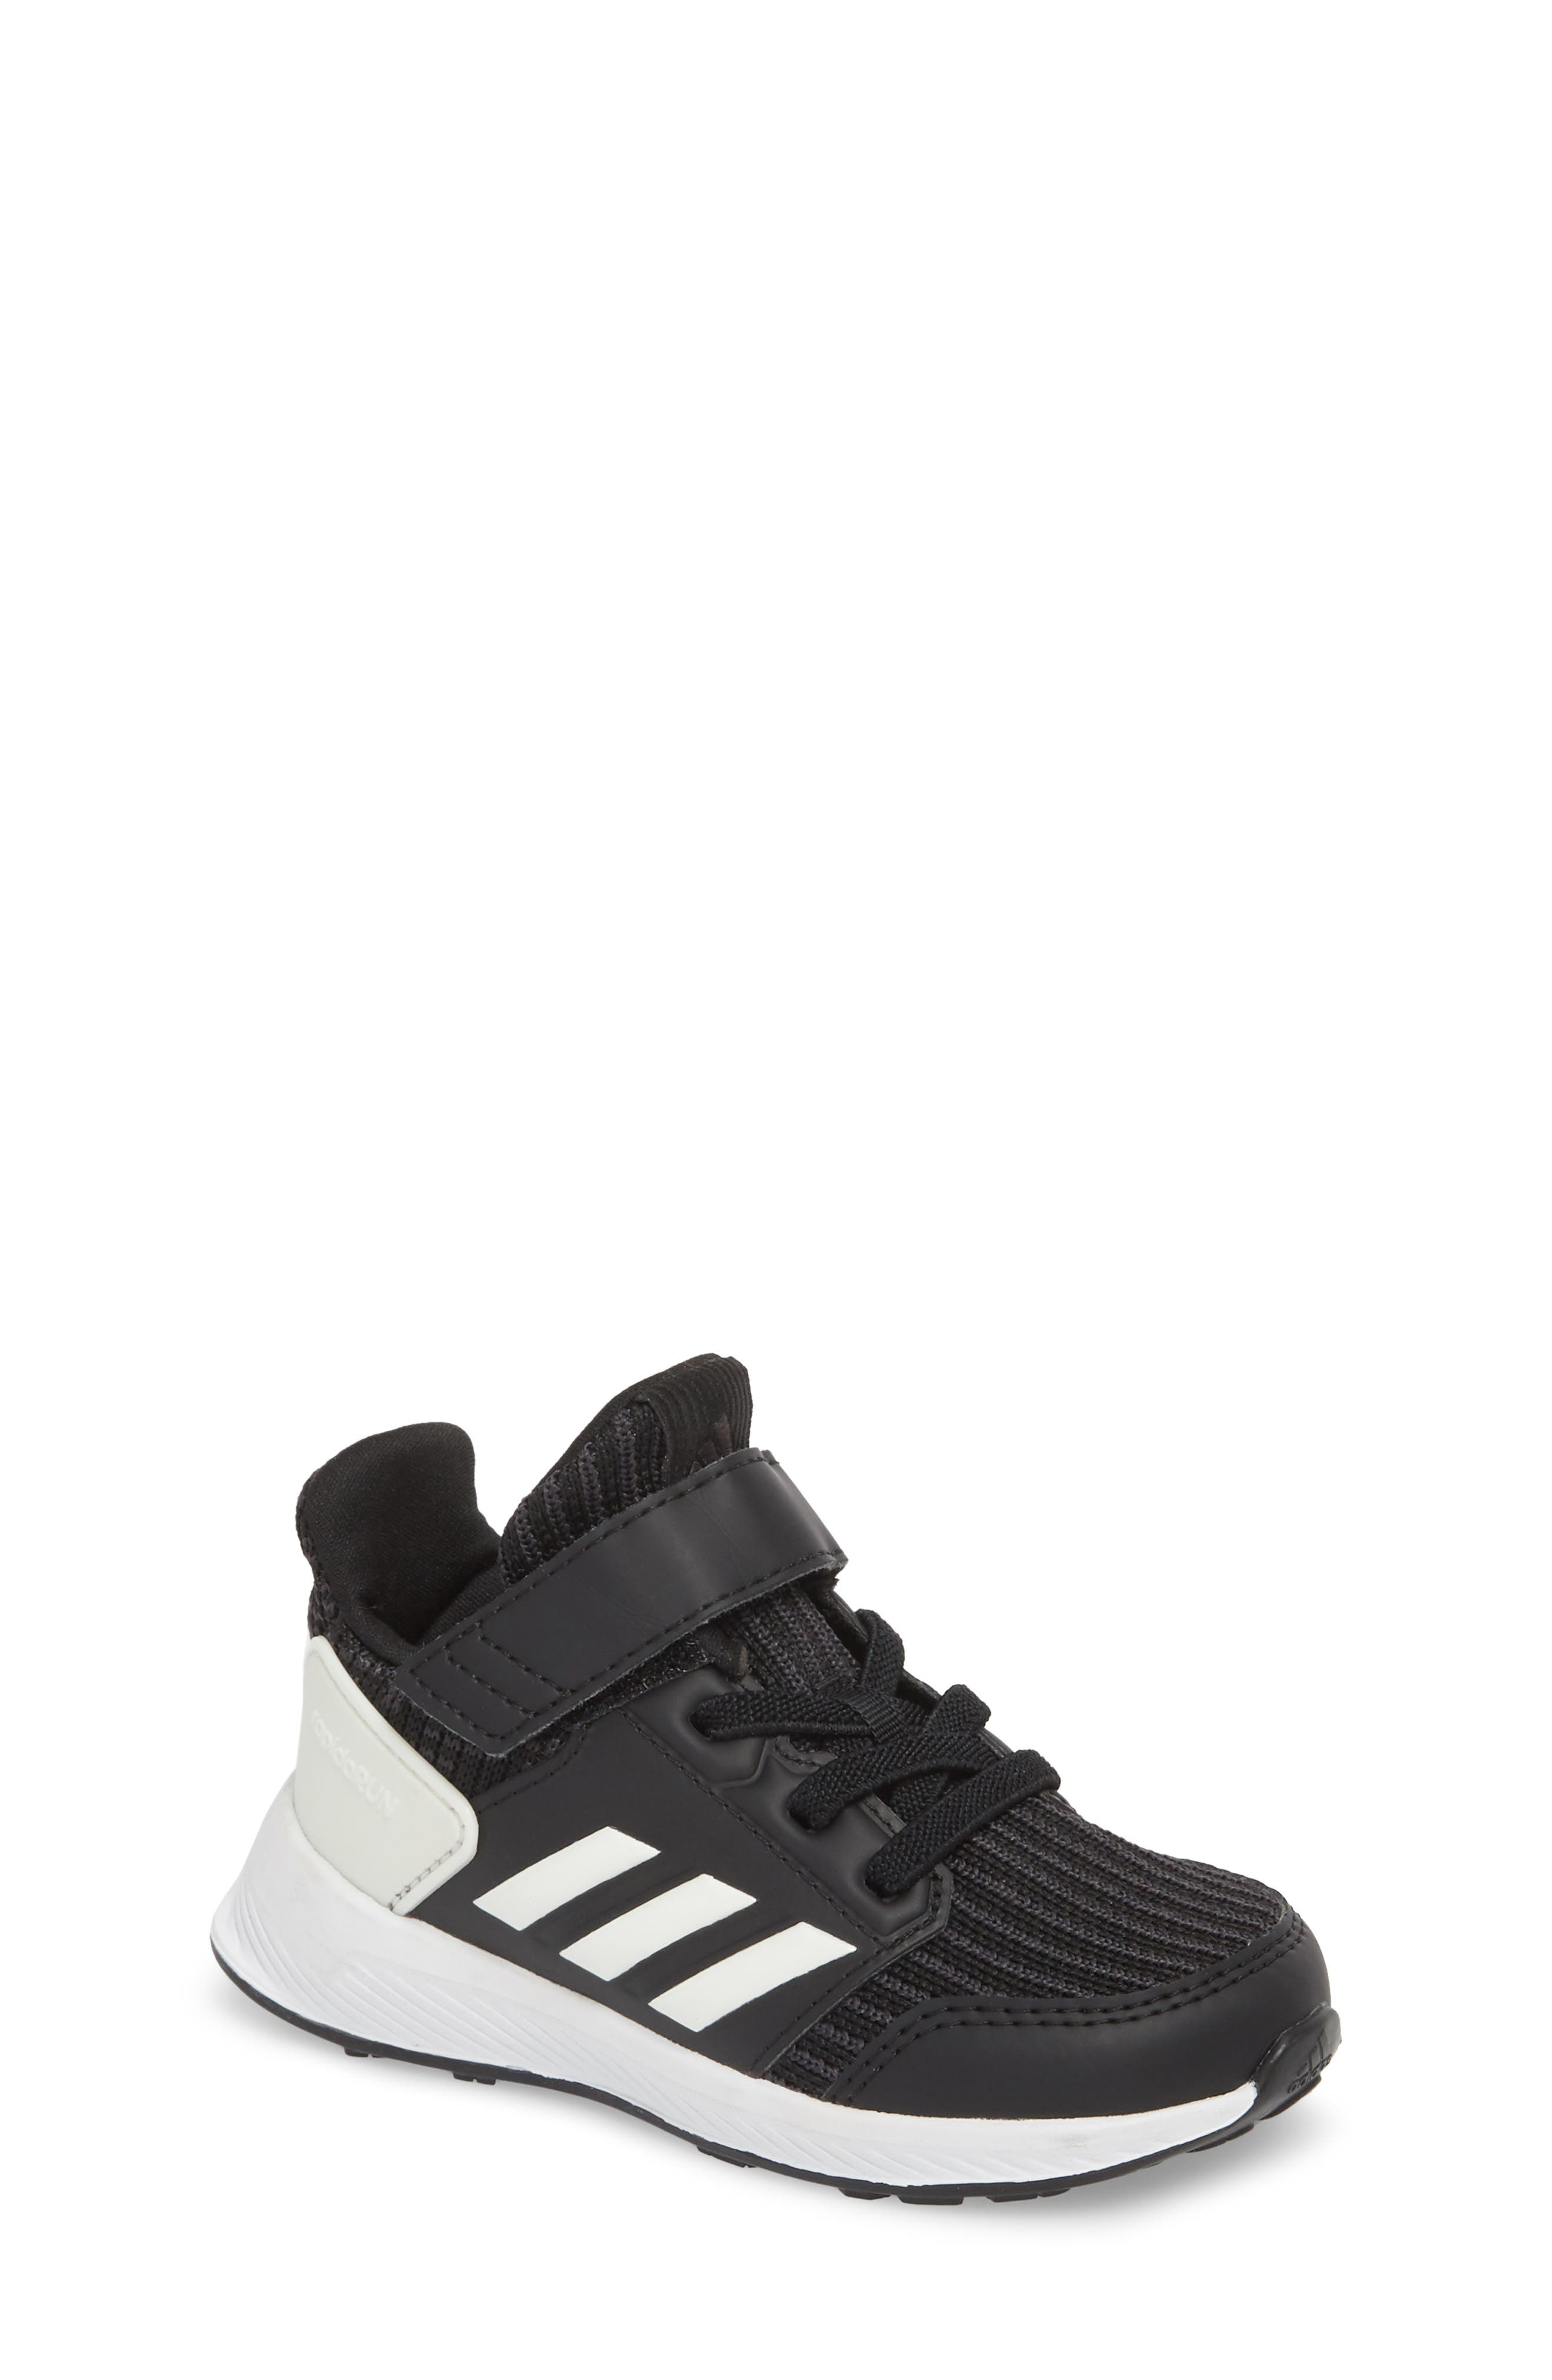 RapidaRun Knit Sneaker,                             Main thumbnail 1, color,                             BLACK/ WHITE